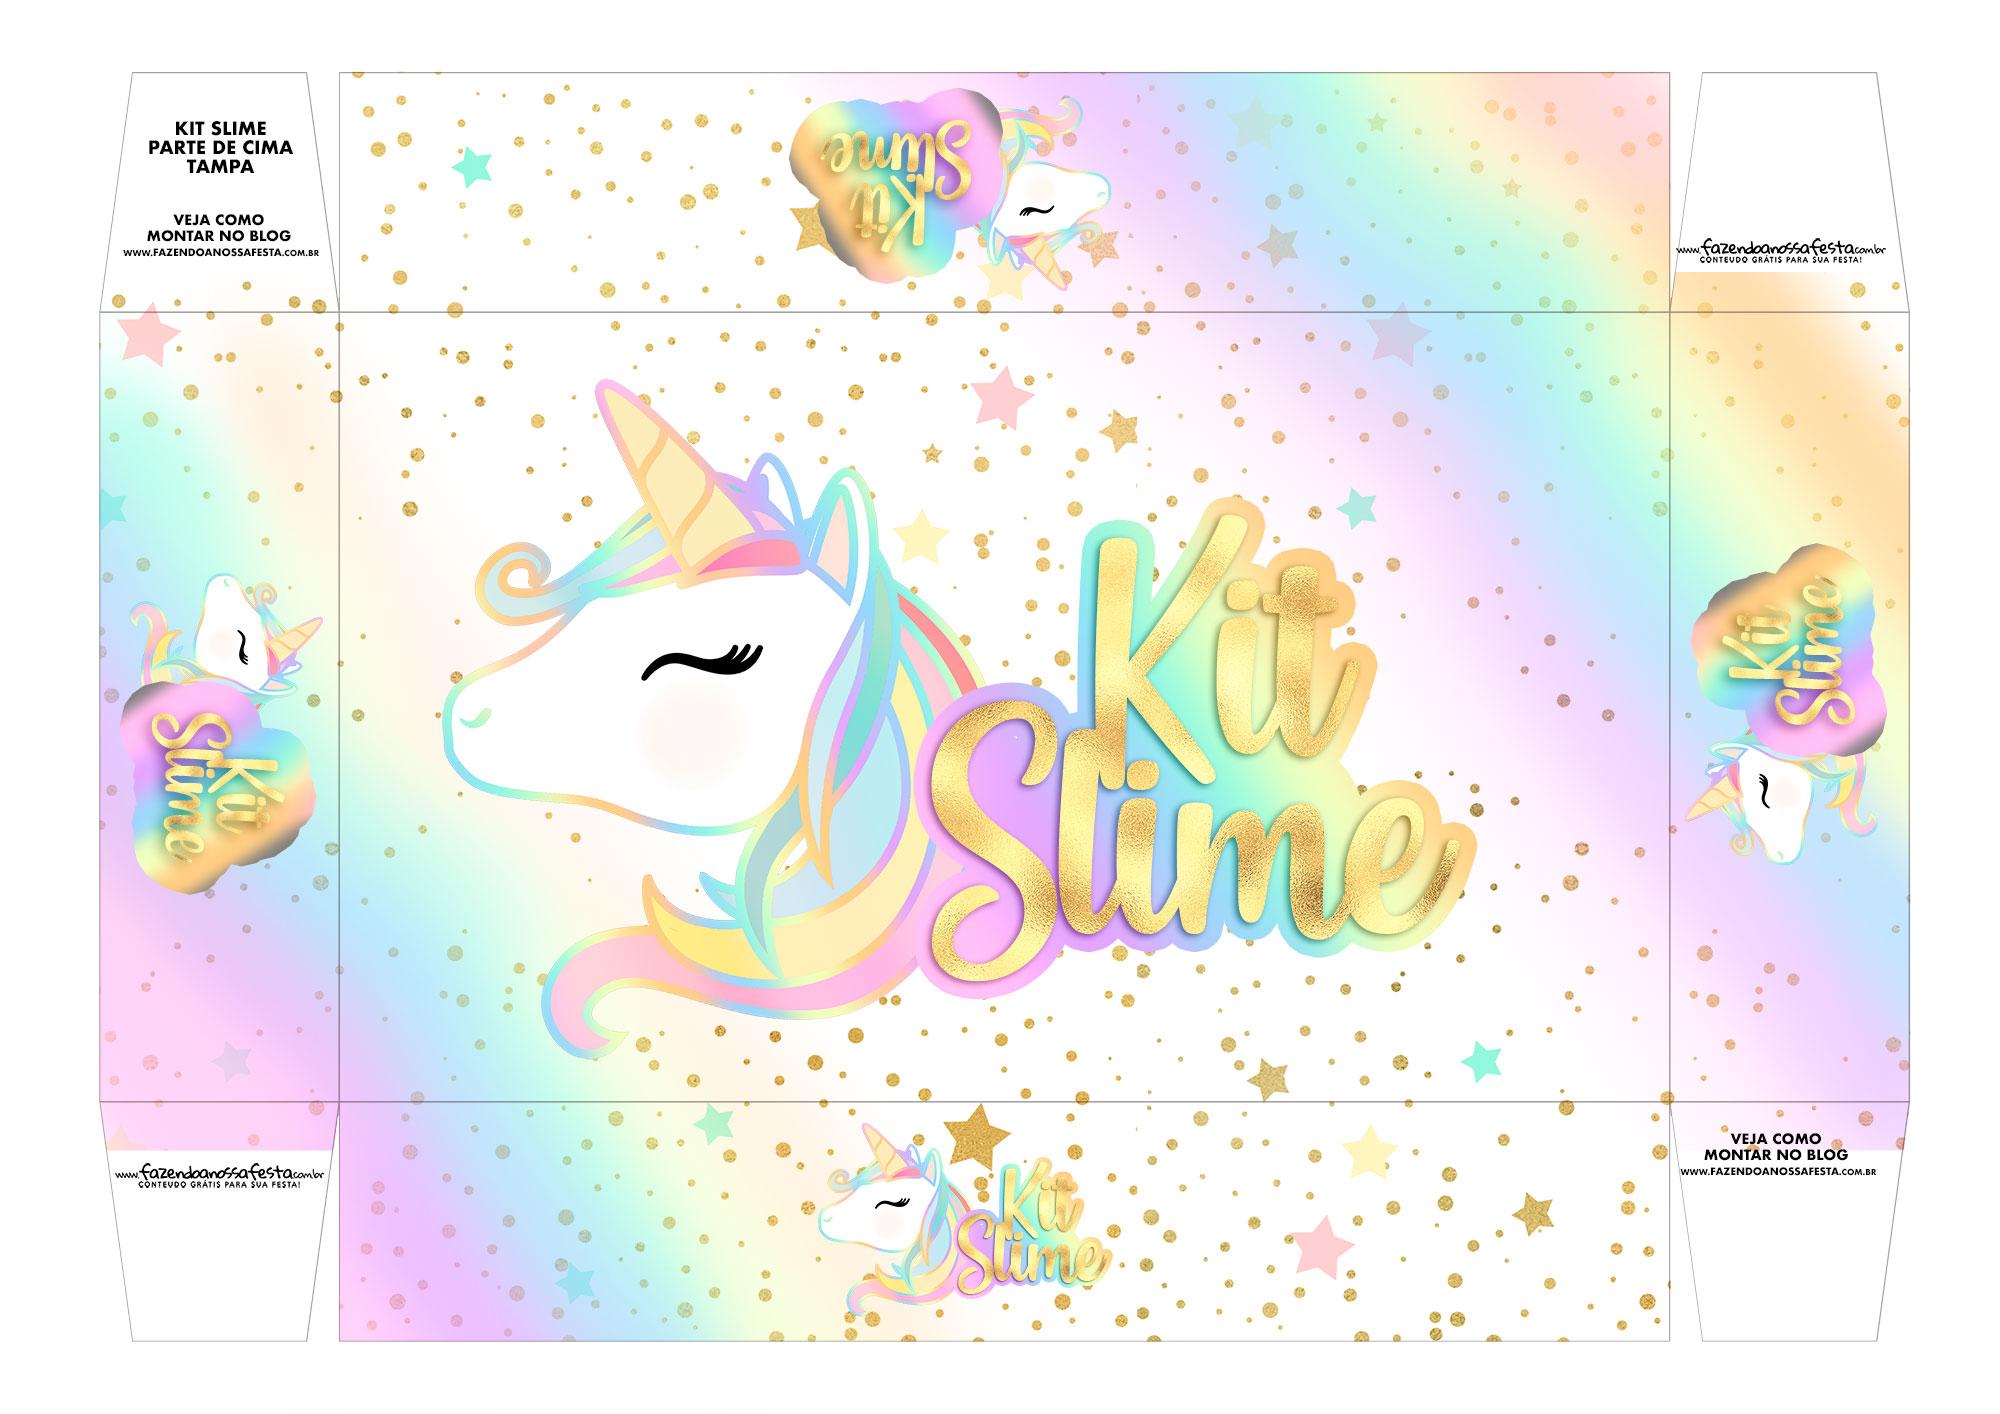 Letras Minegraft Fazendo A Nossa Festa: Lembrancinha Kit Slime Unicornio Tampa